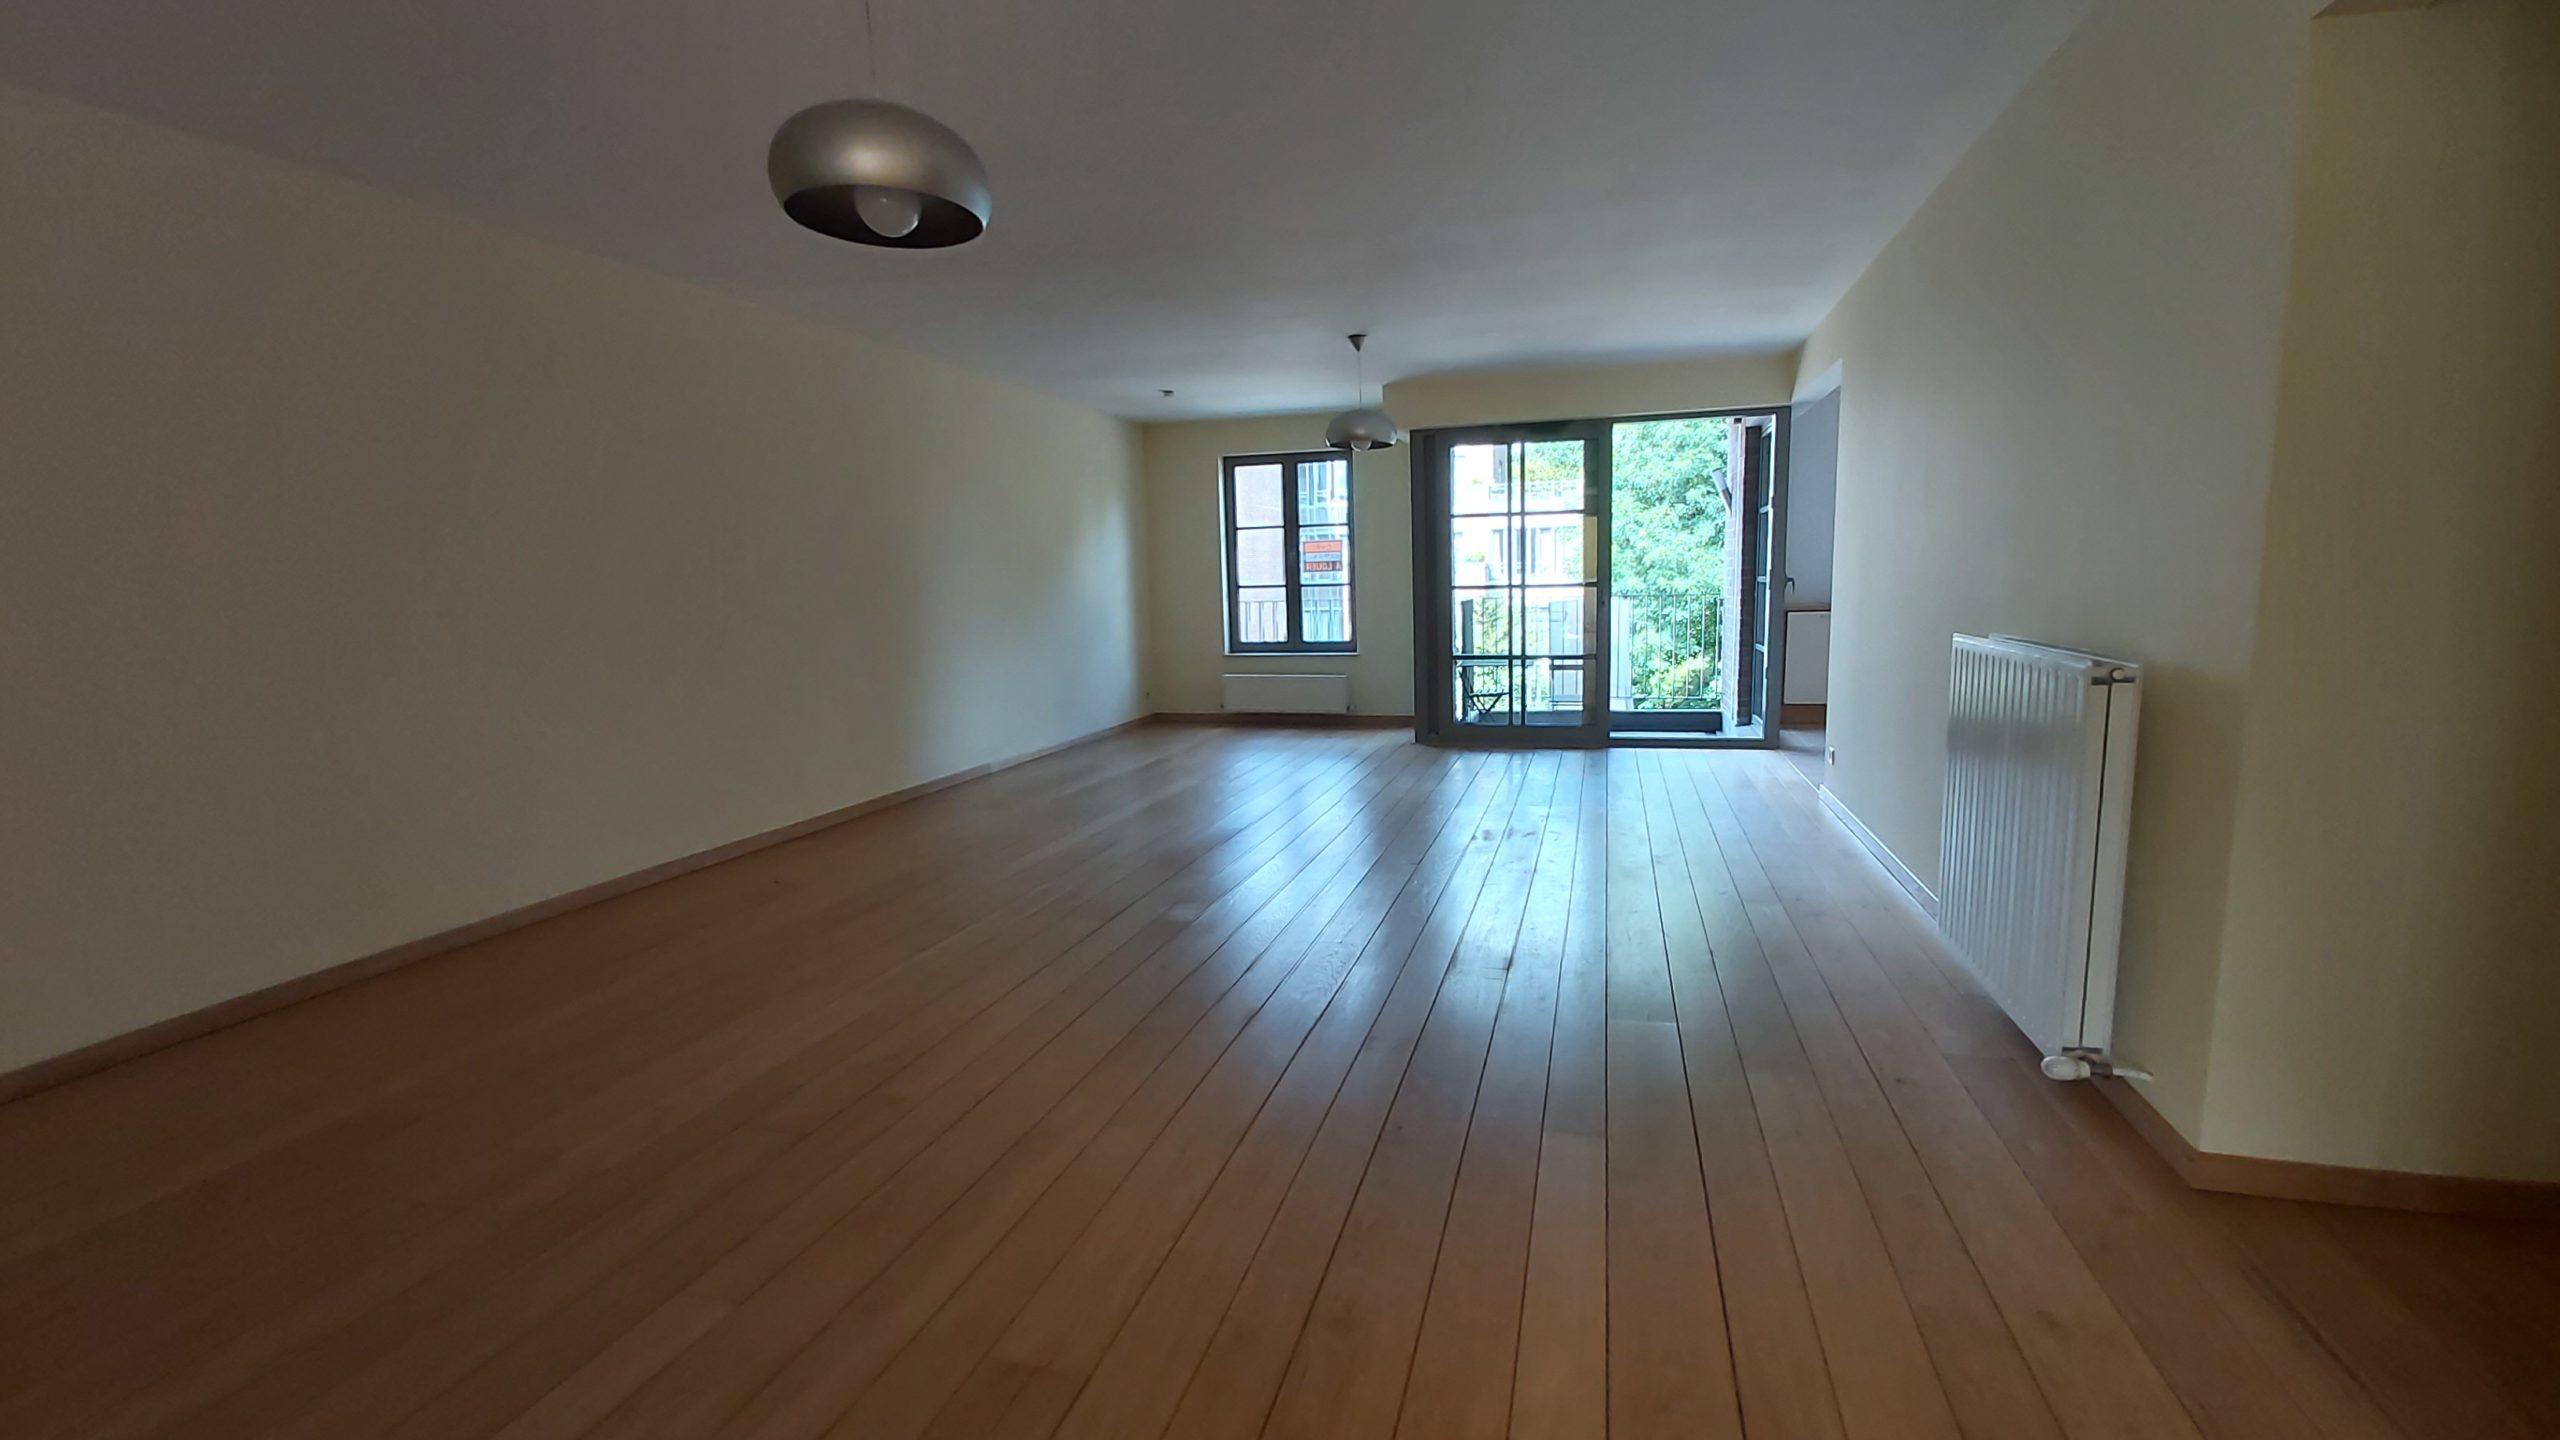 Quartier Saint Michel superbe appartement  2chs 2sdb terrasse et garage